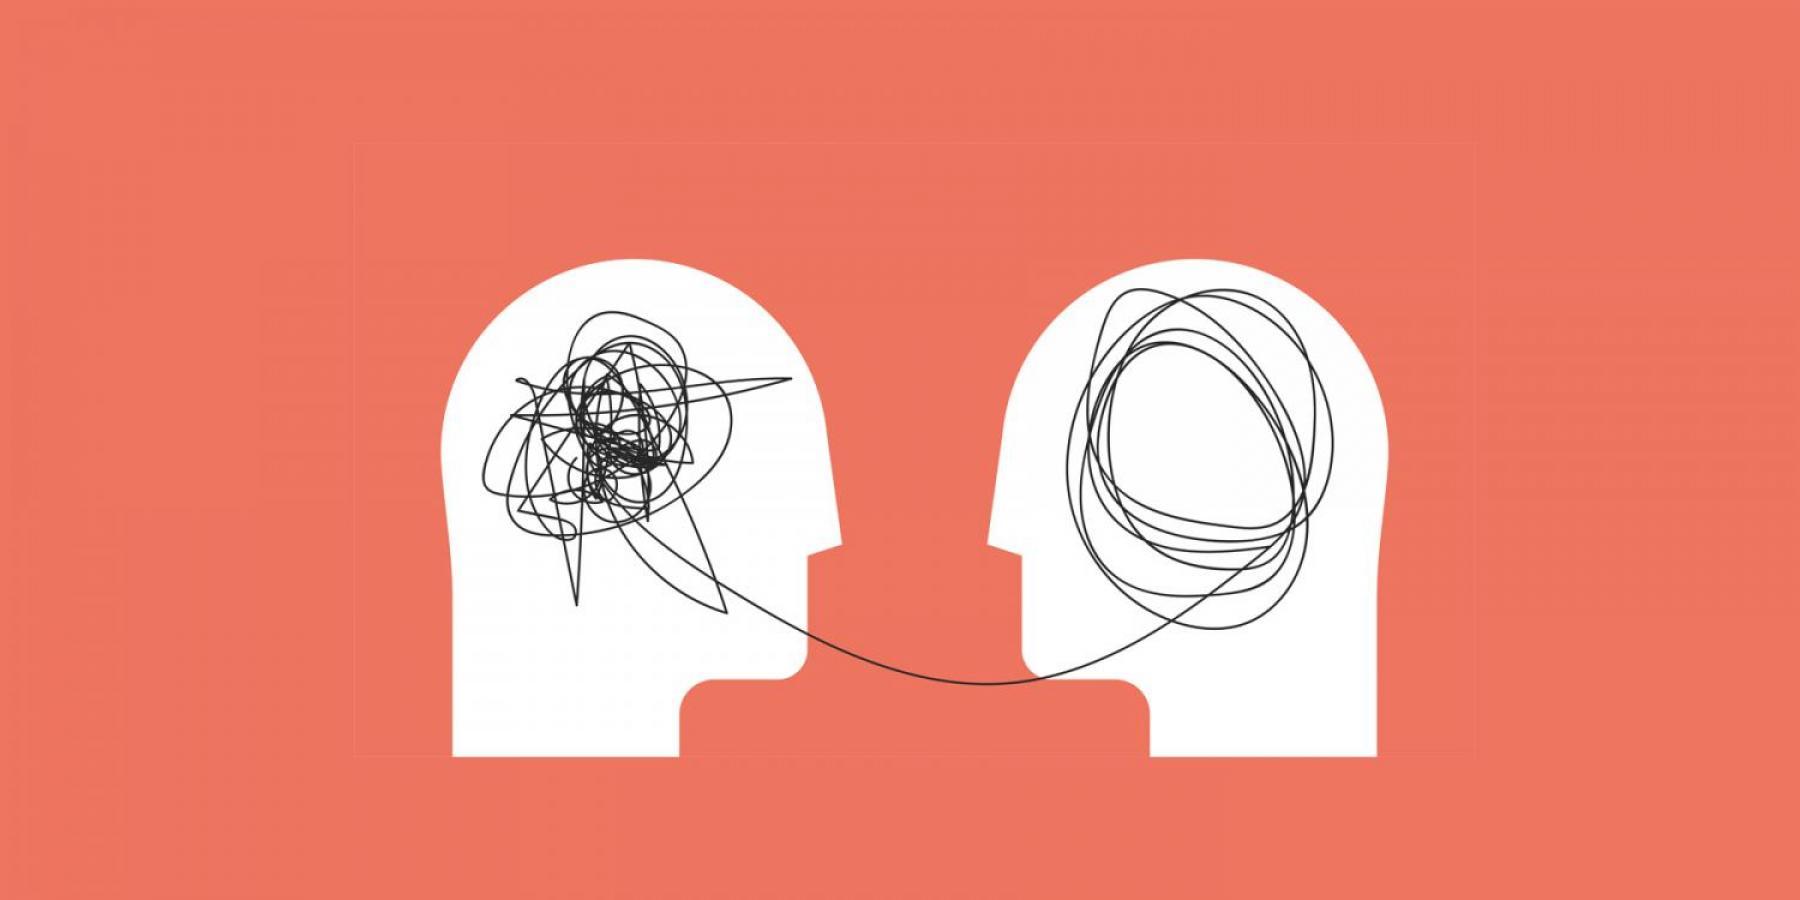 Image depicting mental health support